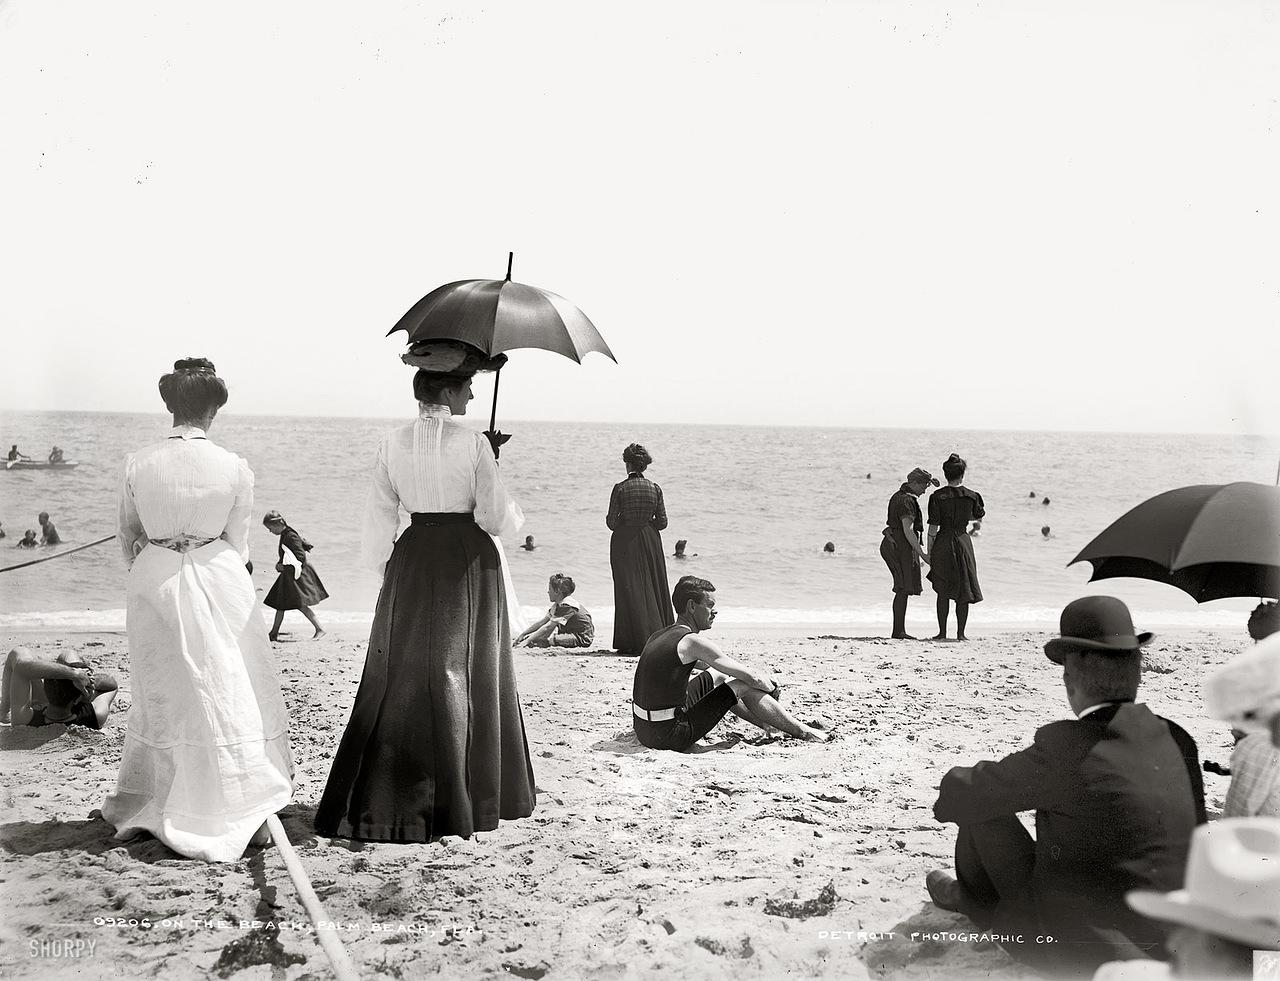 На пляже. Старое фото